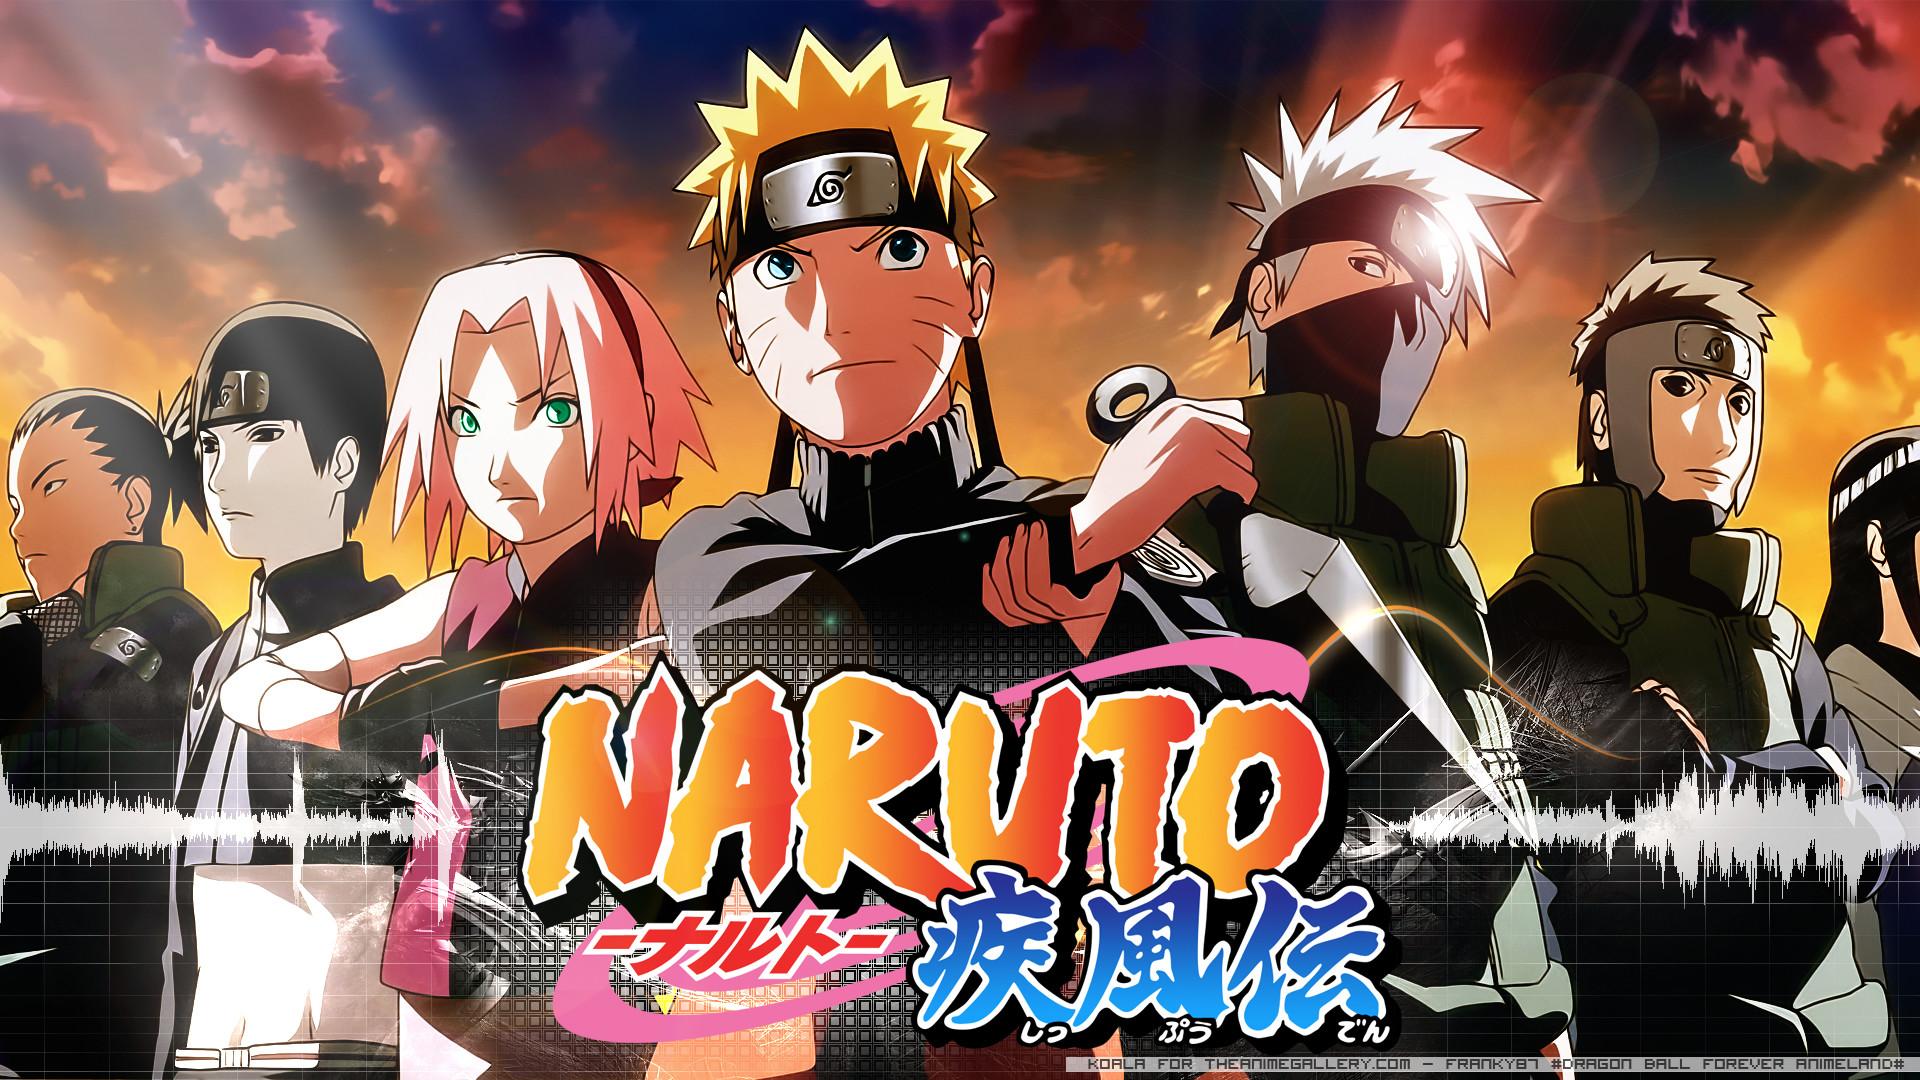 naruto hidden leaf village symbol 0 HTML code. Naruto Shippuden Wallpaper  High Resolution